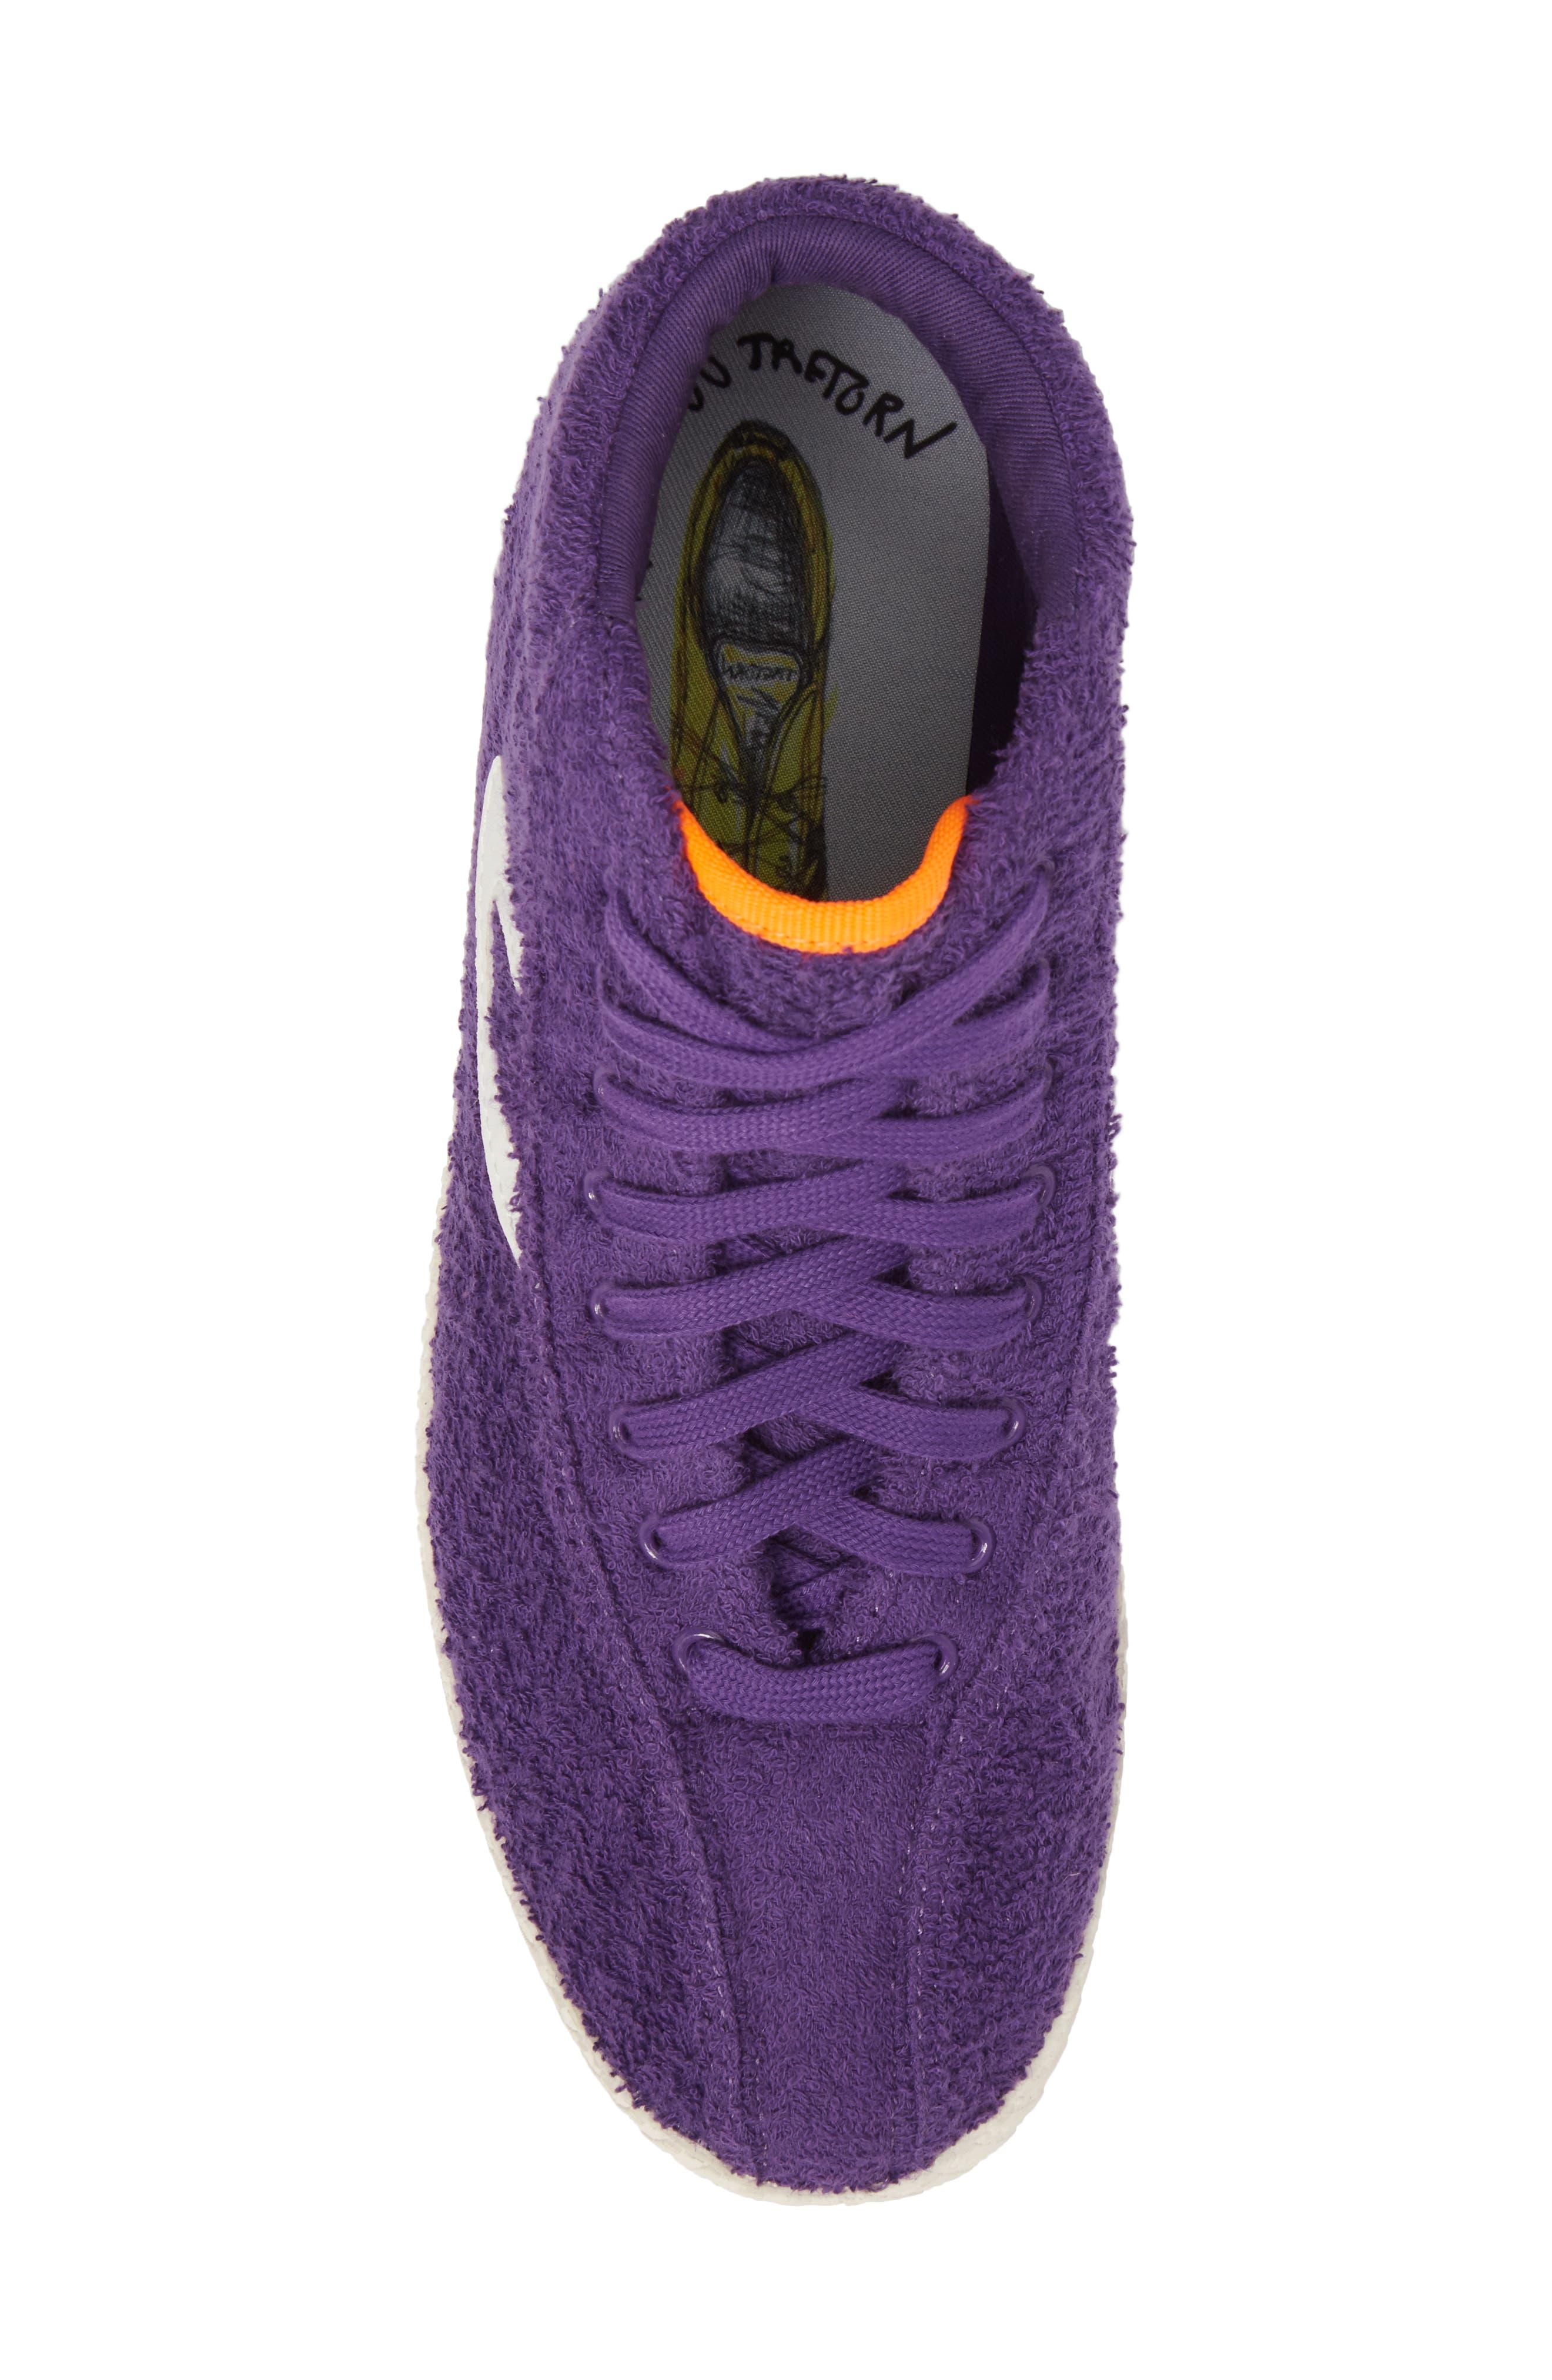 Andre 3000 Nylite High Top Sneaker,                             Alternate thumbnail 5, color,                             Vibrant Purple/ Vintage White